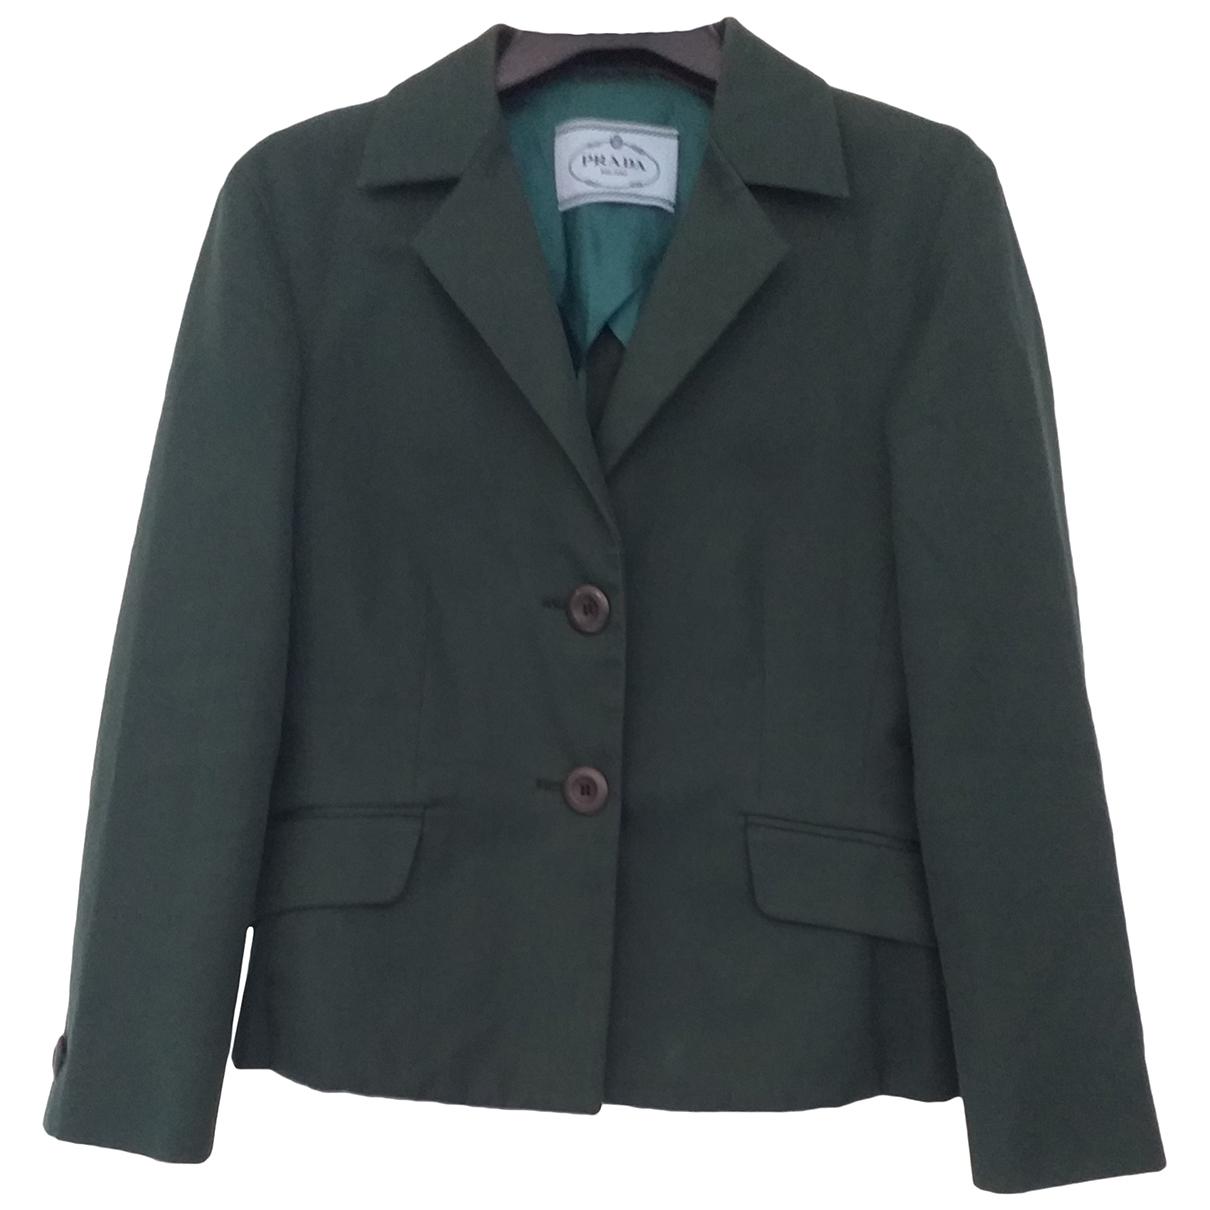 Prada \N Green Cotton jacket for Women 42 IT